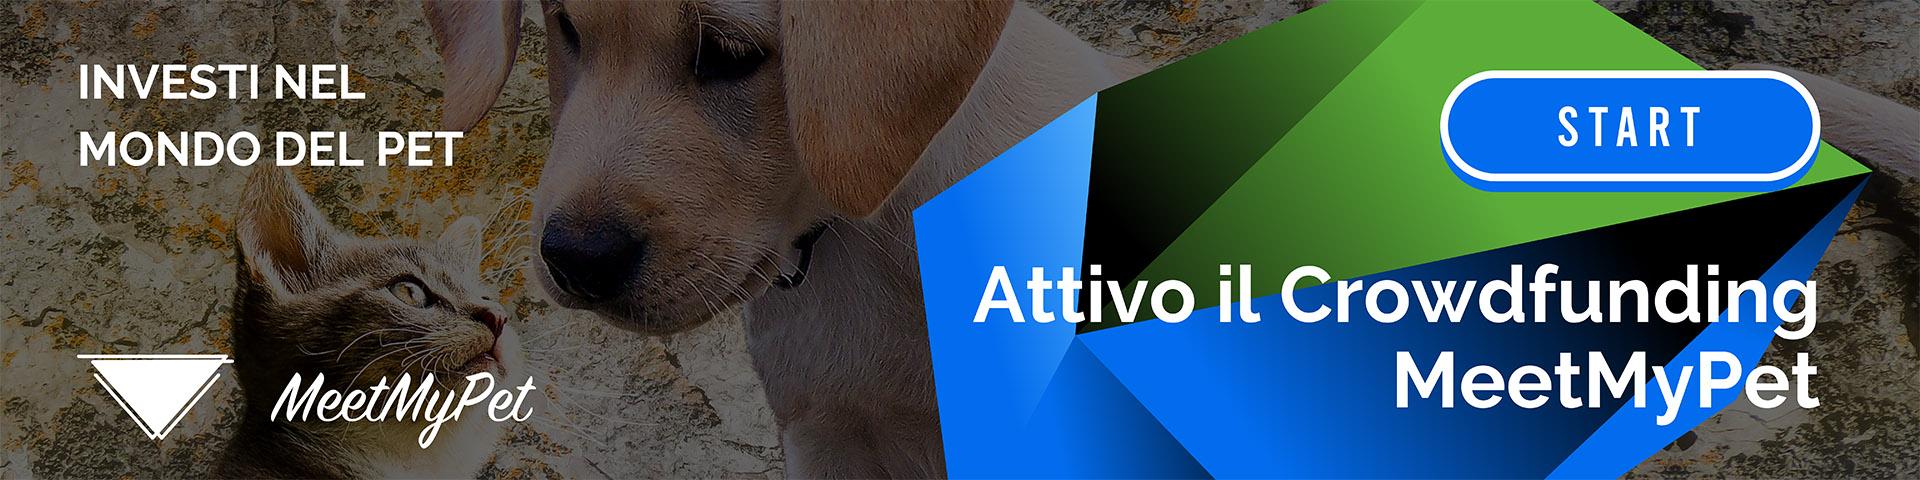 Crowdfunding Pet MeetMyPet